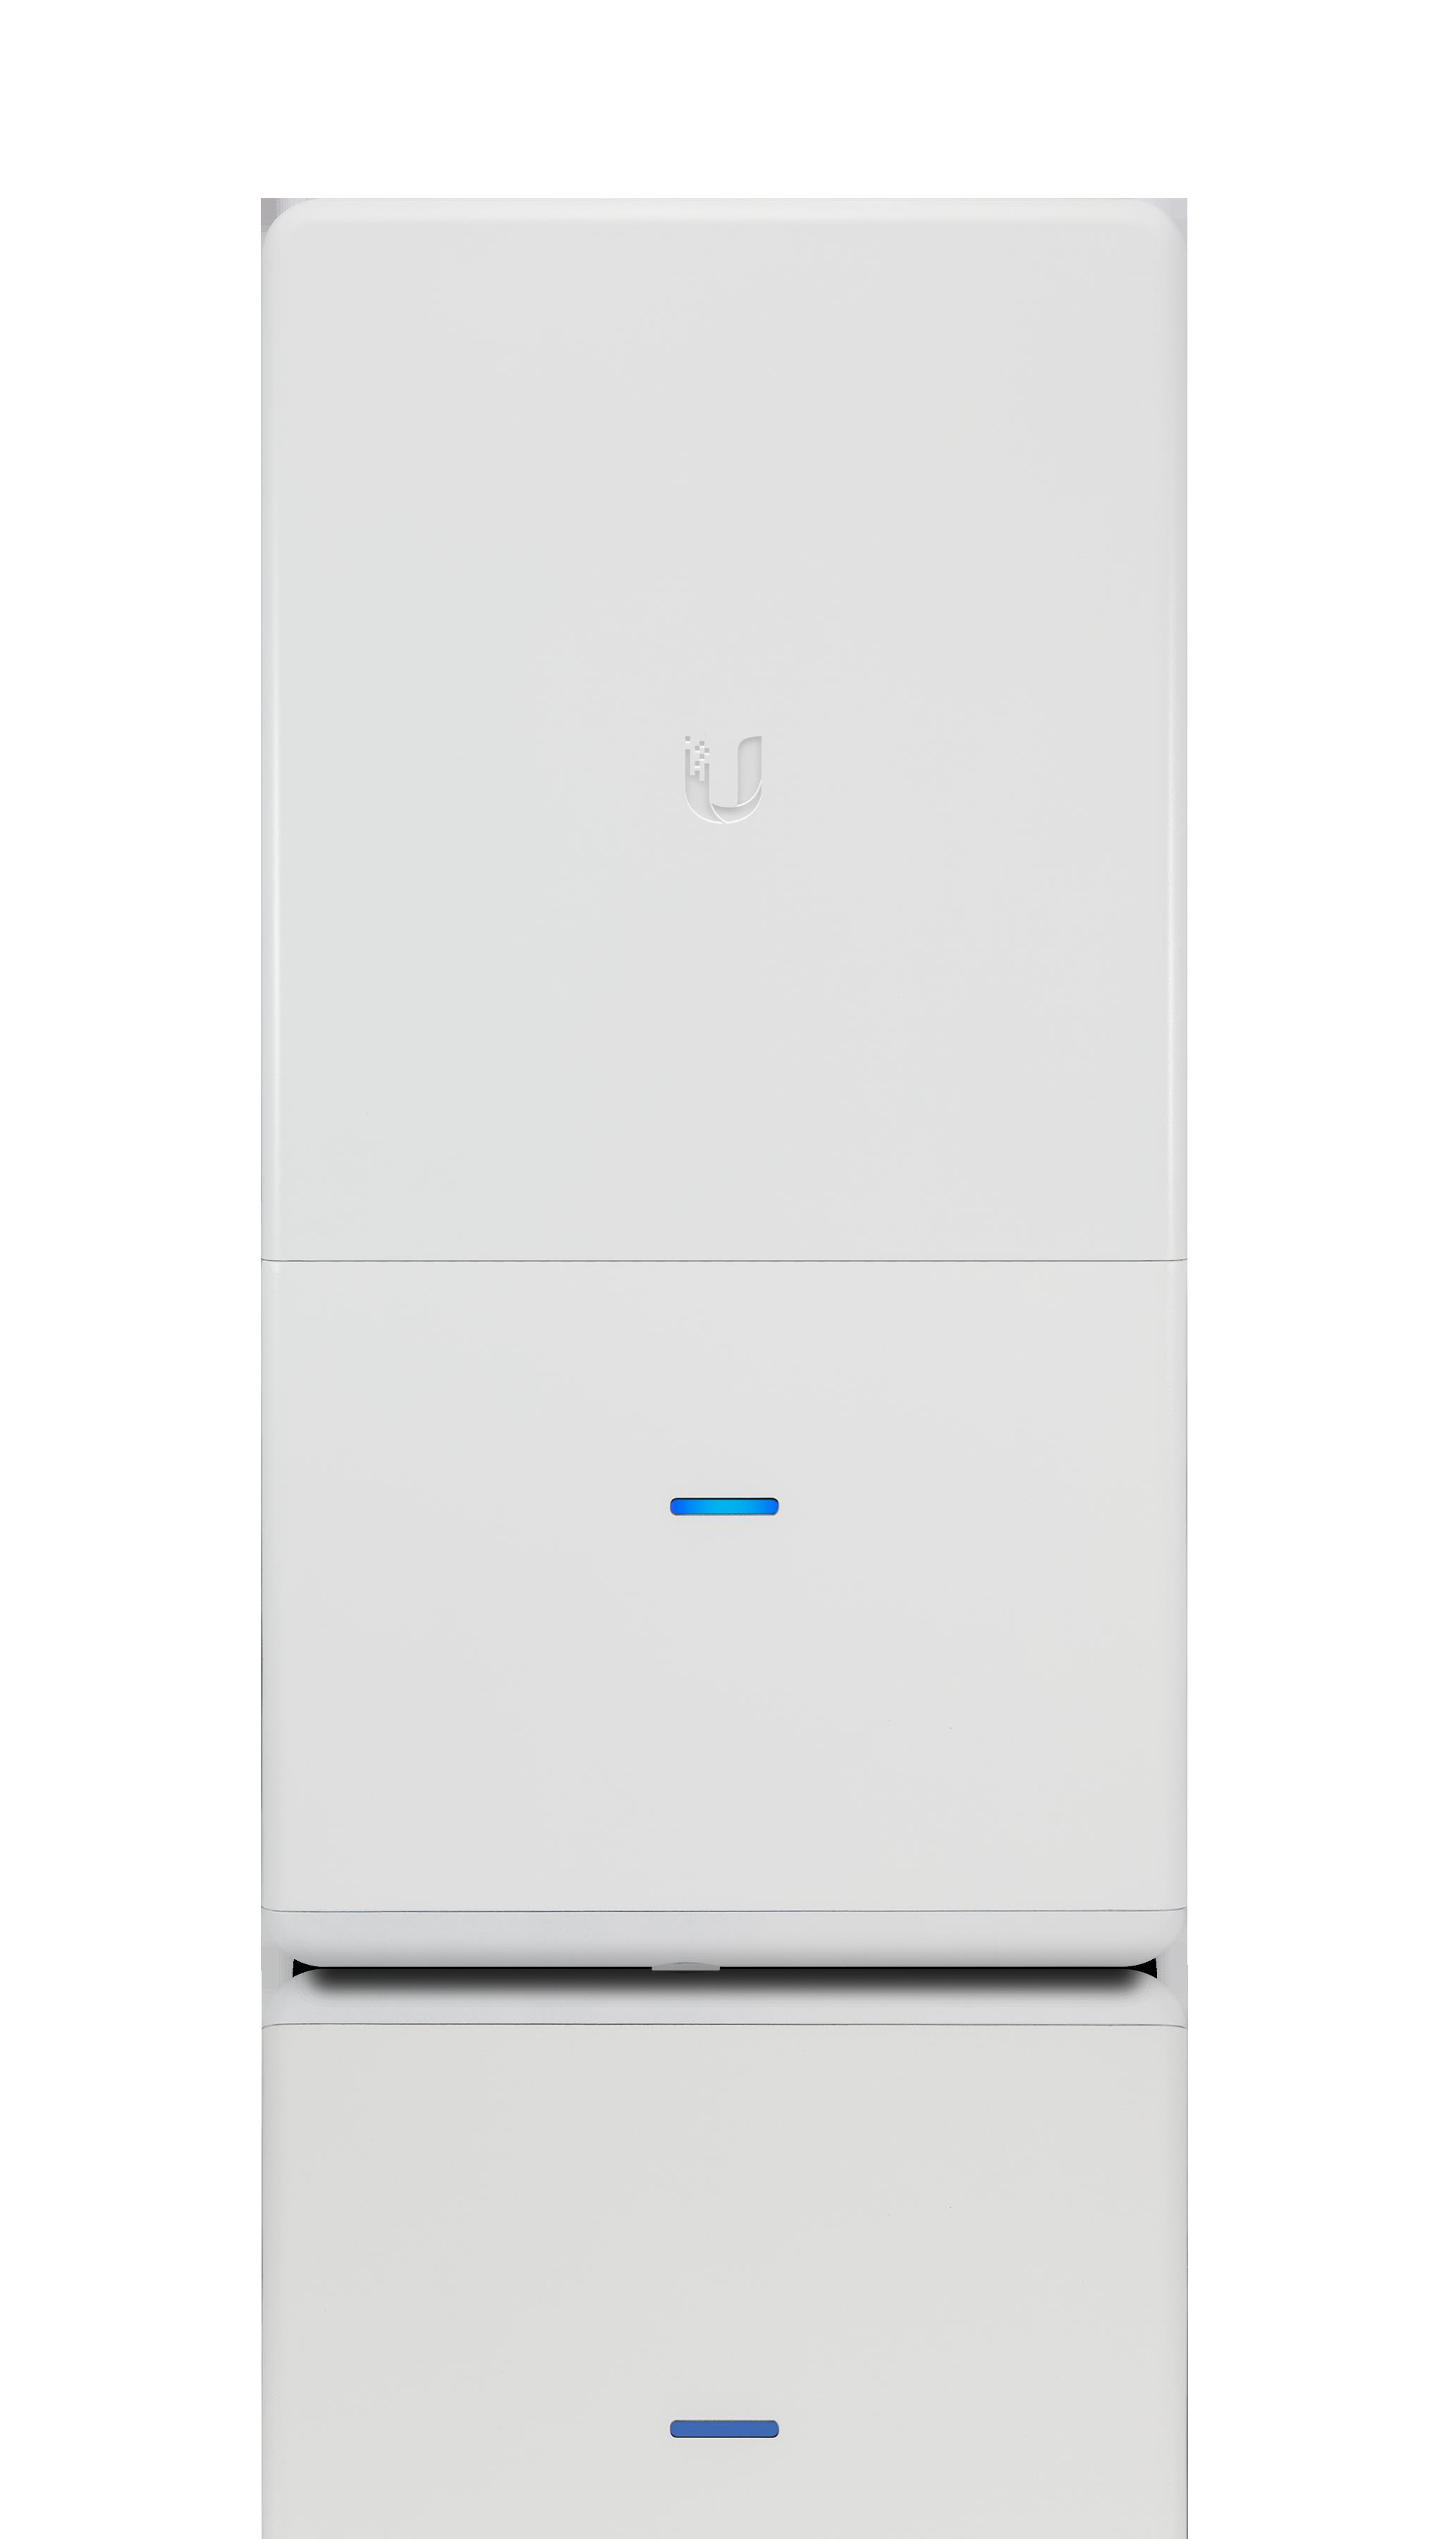 UAP-AC-Outdoor UniFi AP AC Outdoor